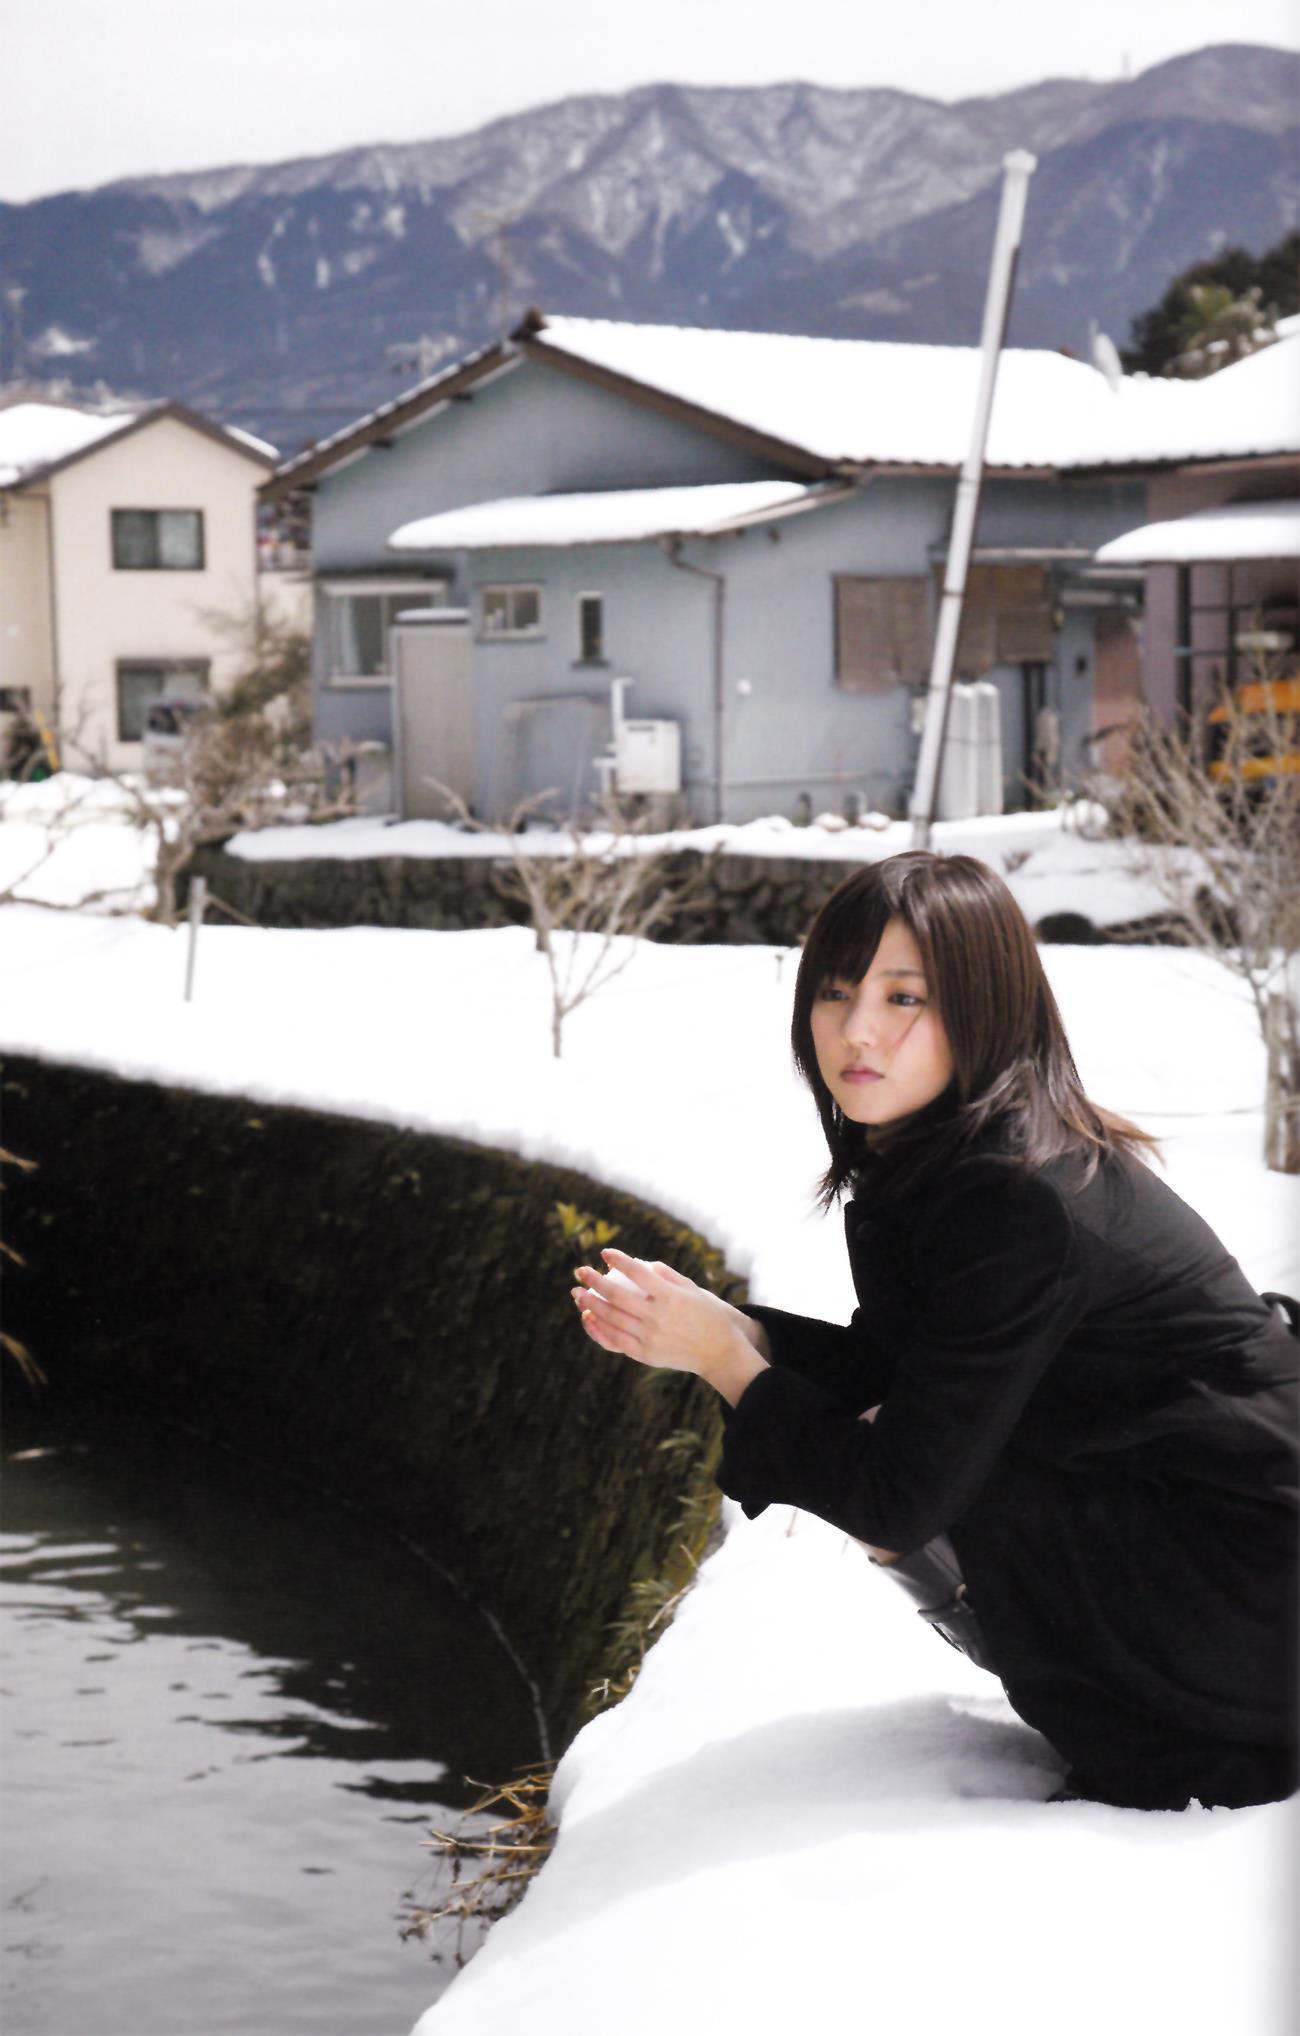 真野恵里菜 エロ画像 162